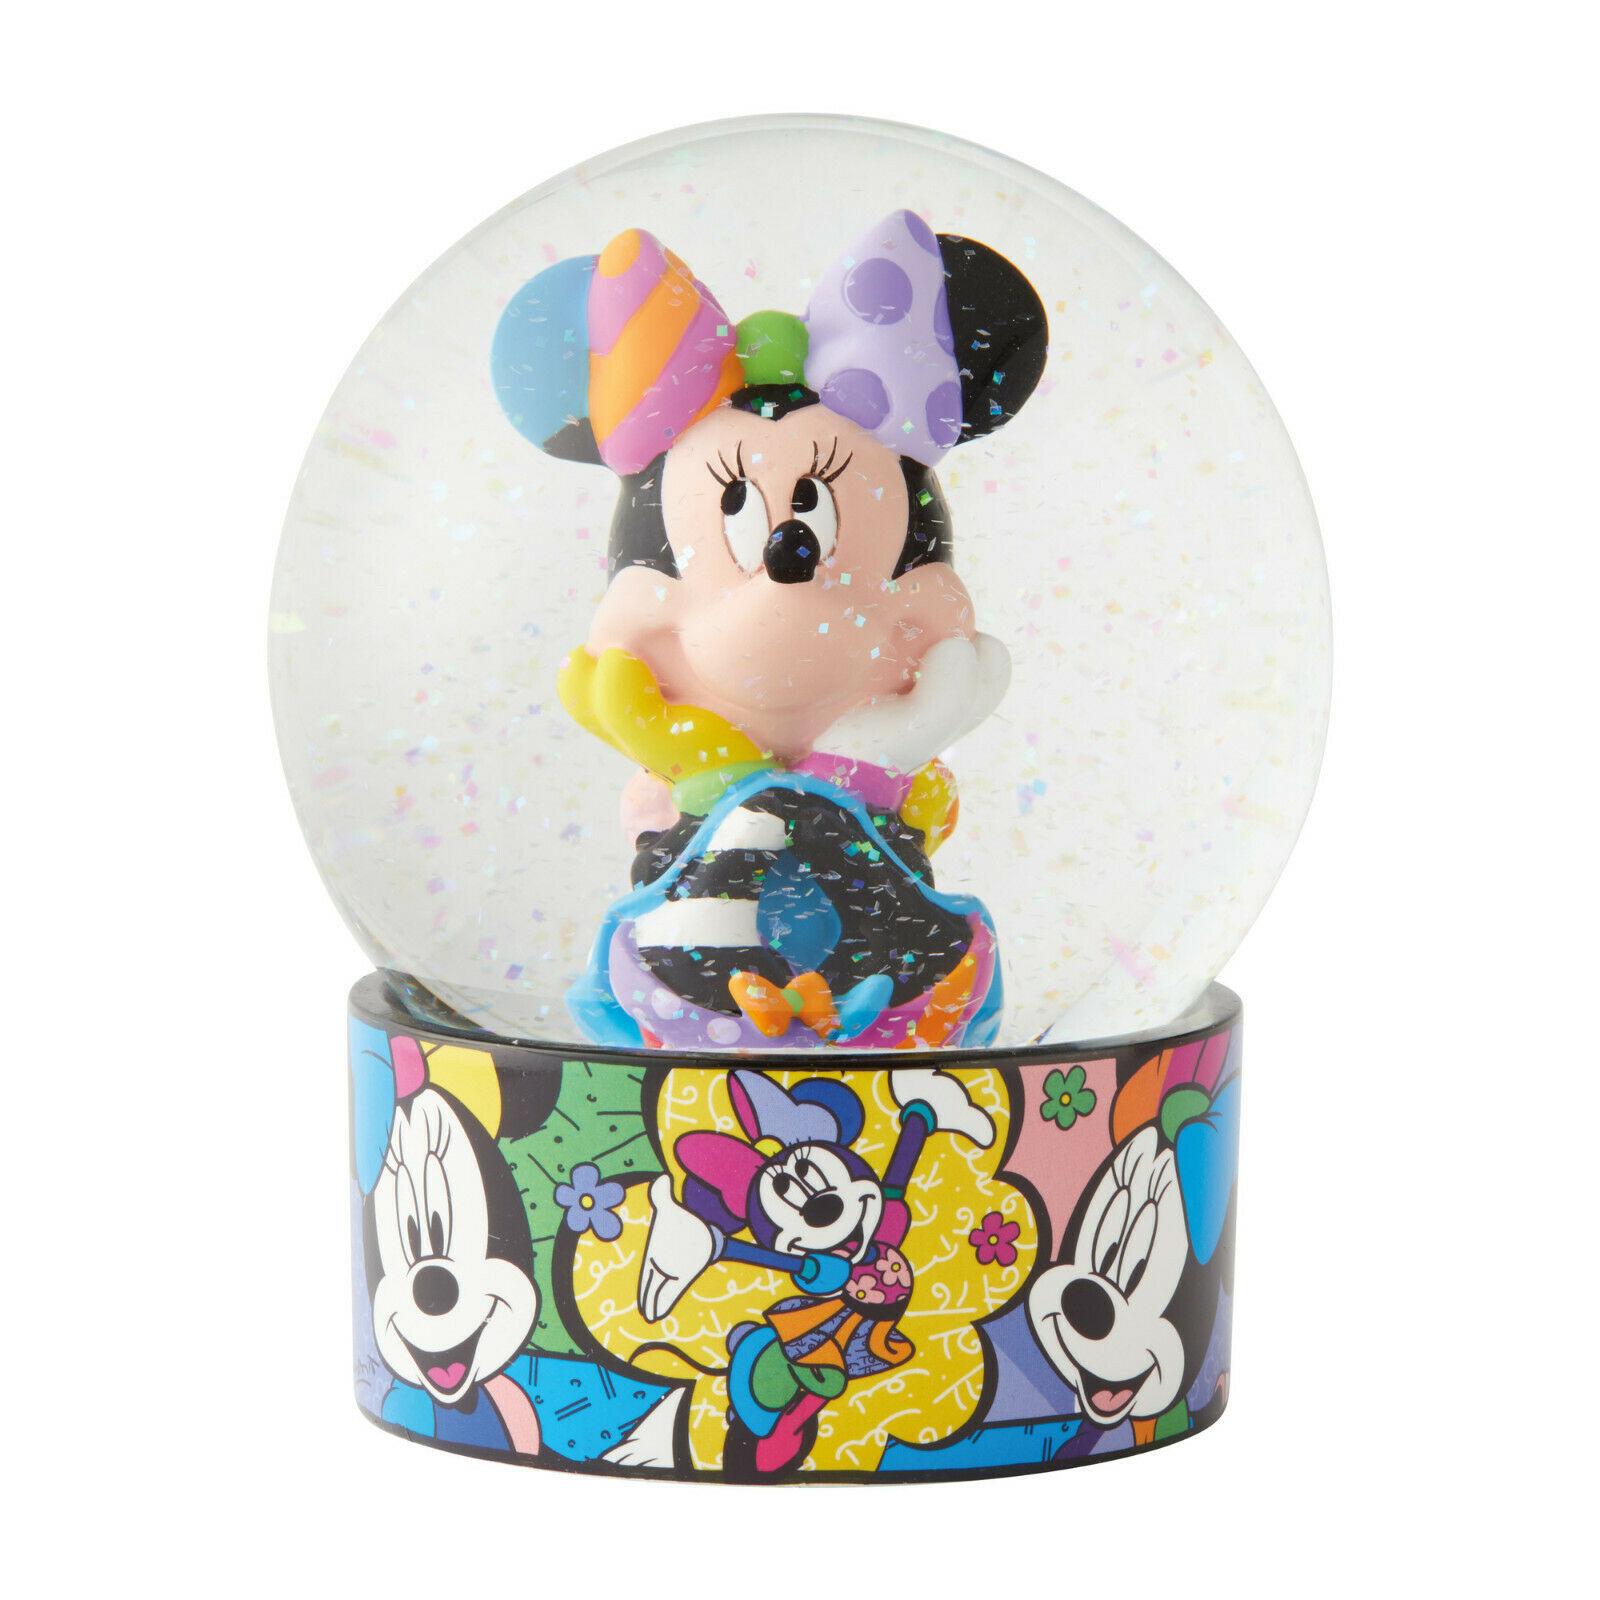 "Disney Britto Minnie Mouse Water Ball Globe w Glitter 5.12"" Collectible Gift"